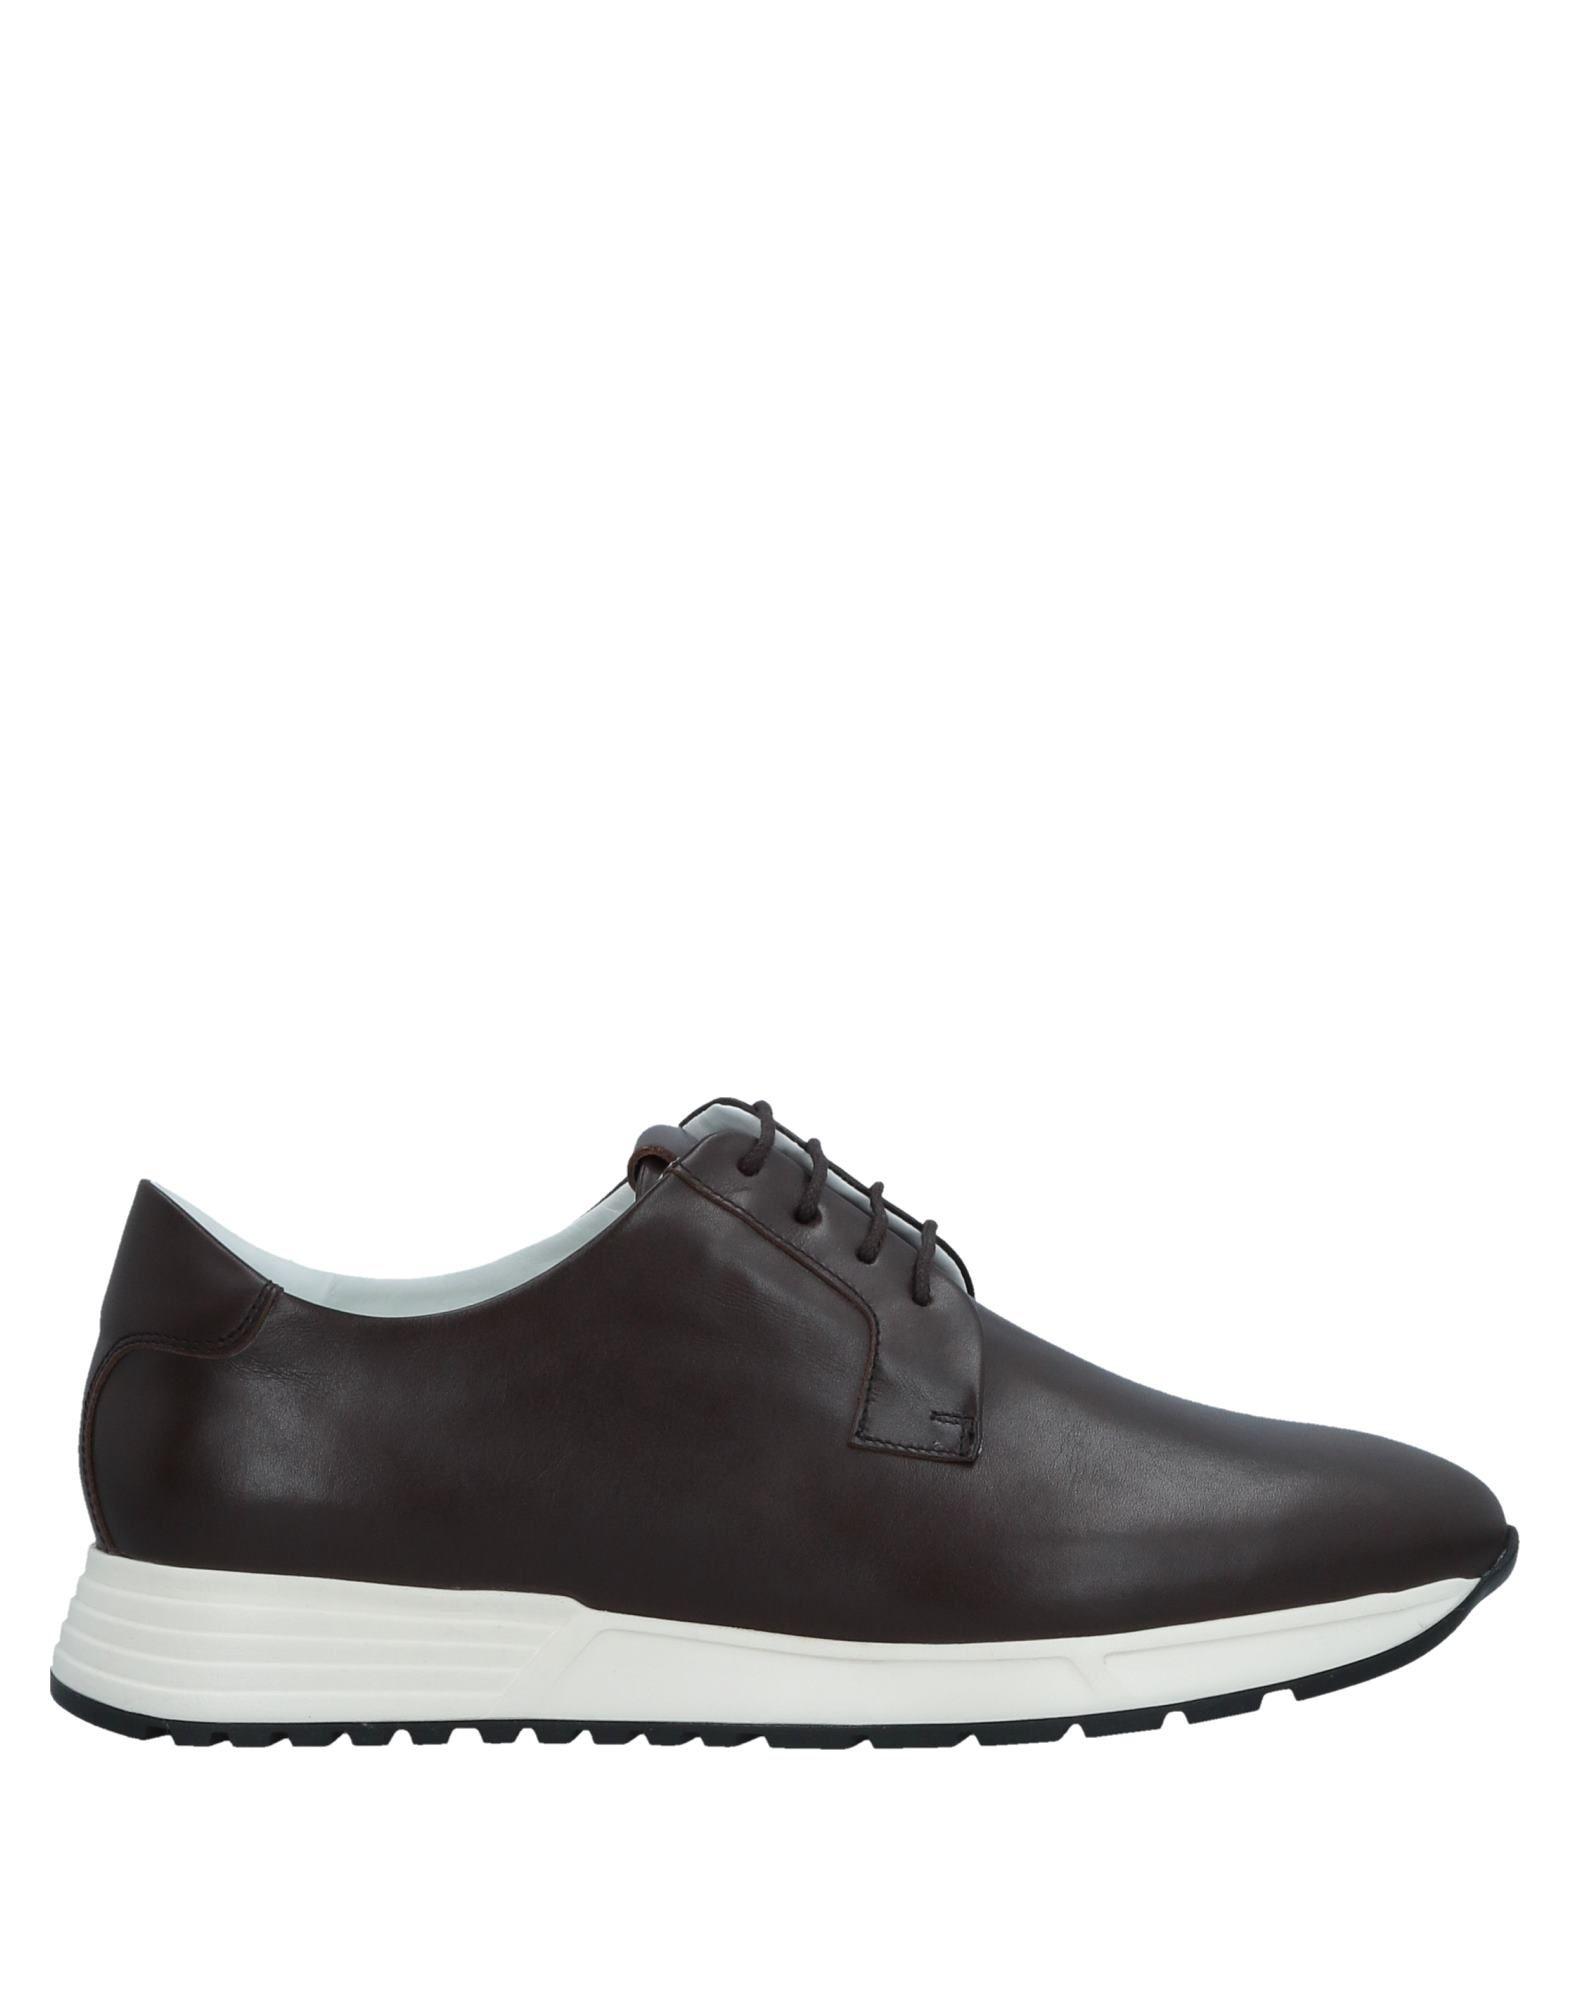 Armani Collezioni Sneakers Herren  11420234UO Gute Qualität beliebte Schuhe